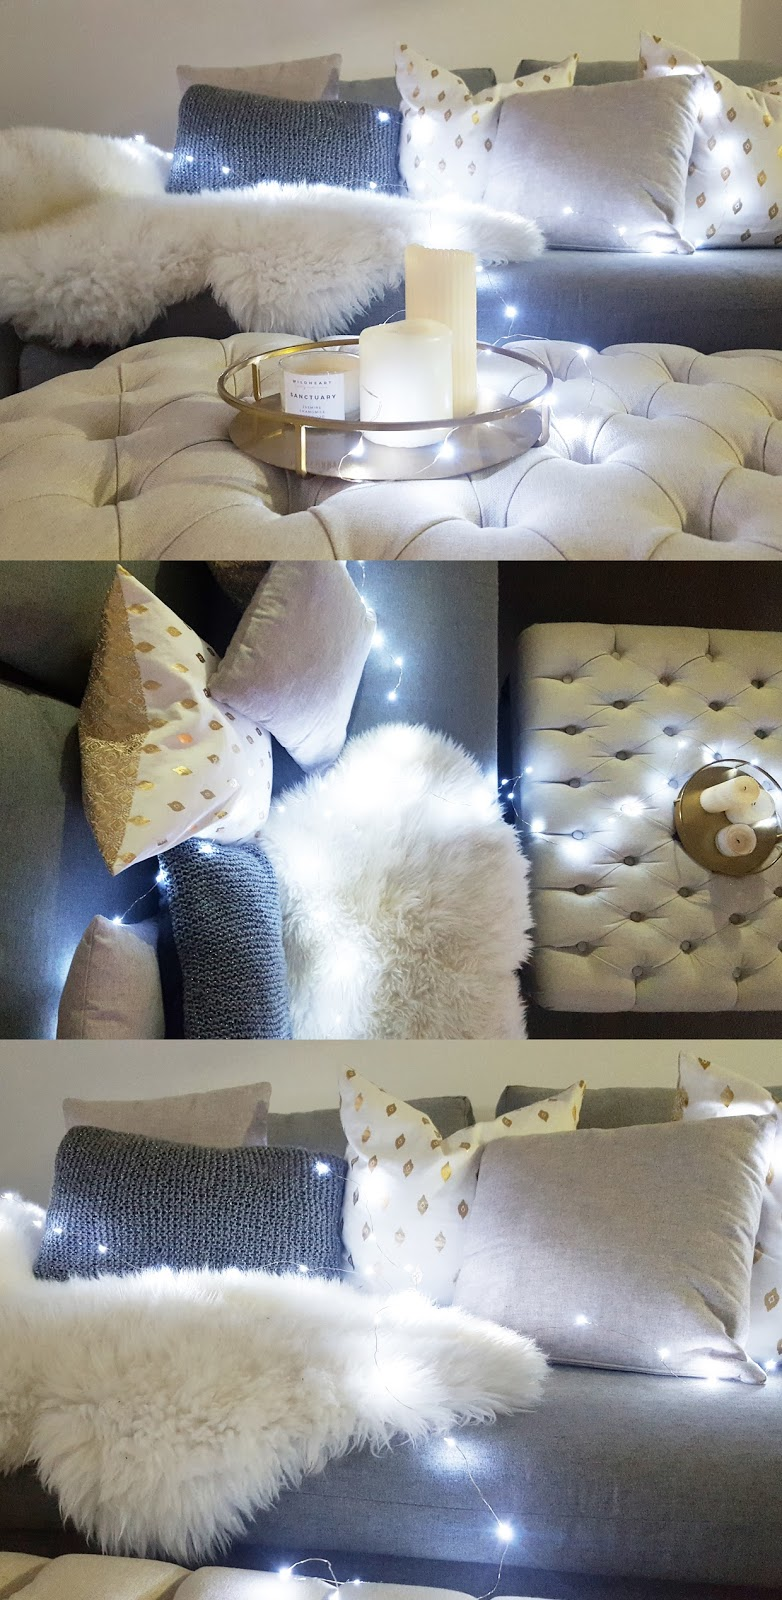 fairylights on sofa